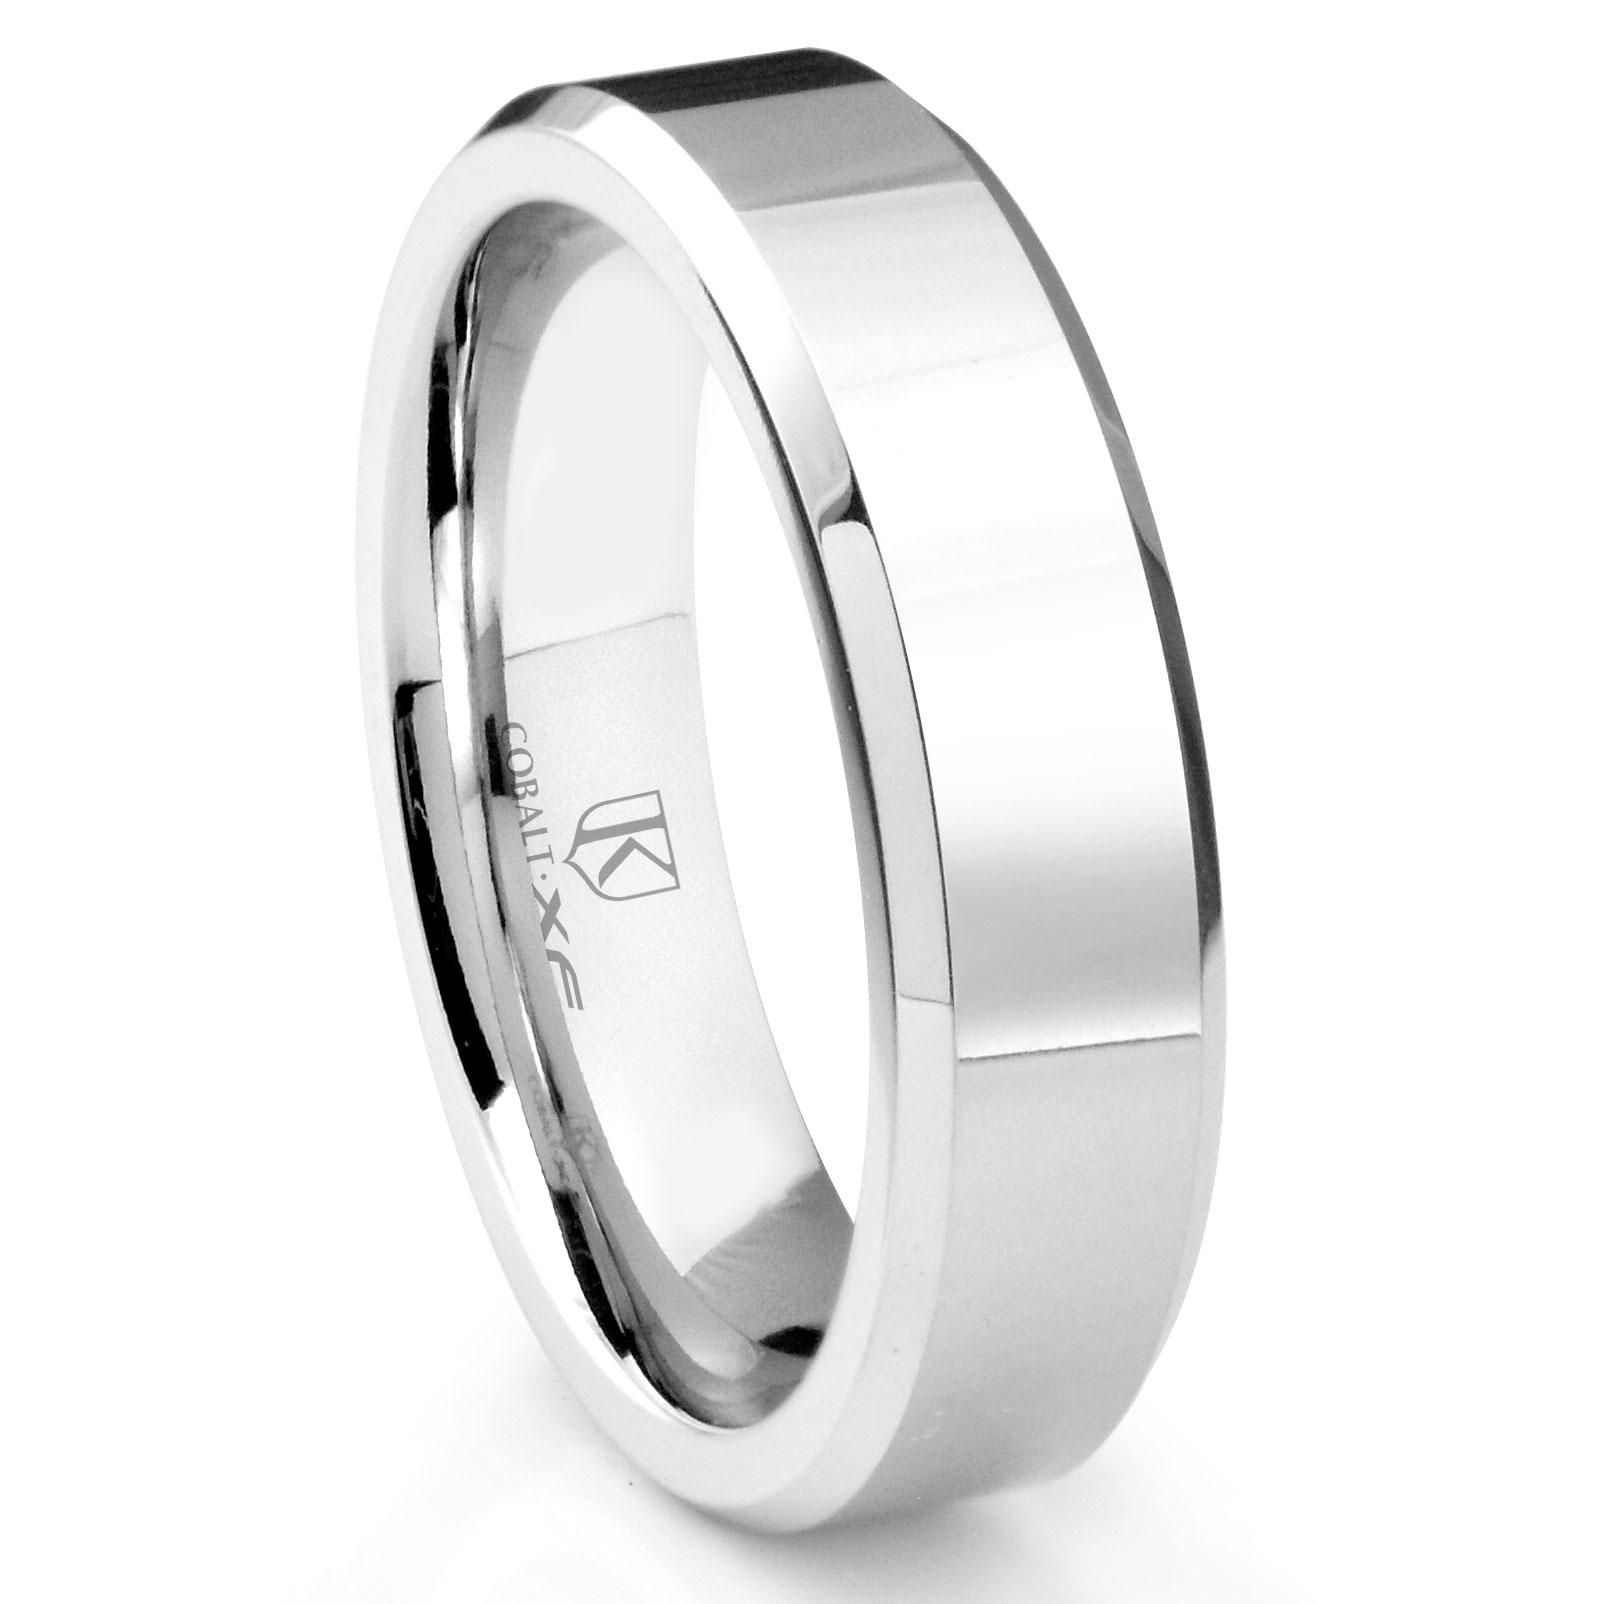 Cobalt Xf Chrome 6mm High Polish Beveled Wedding Band Ring